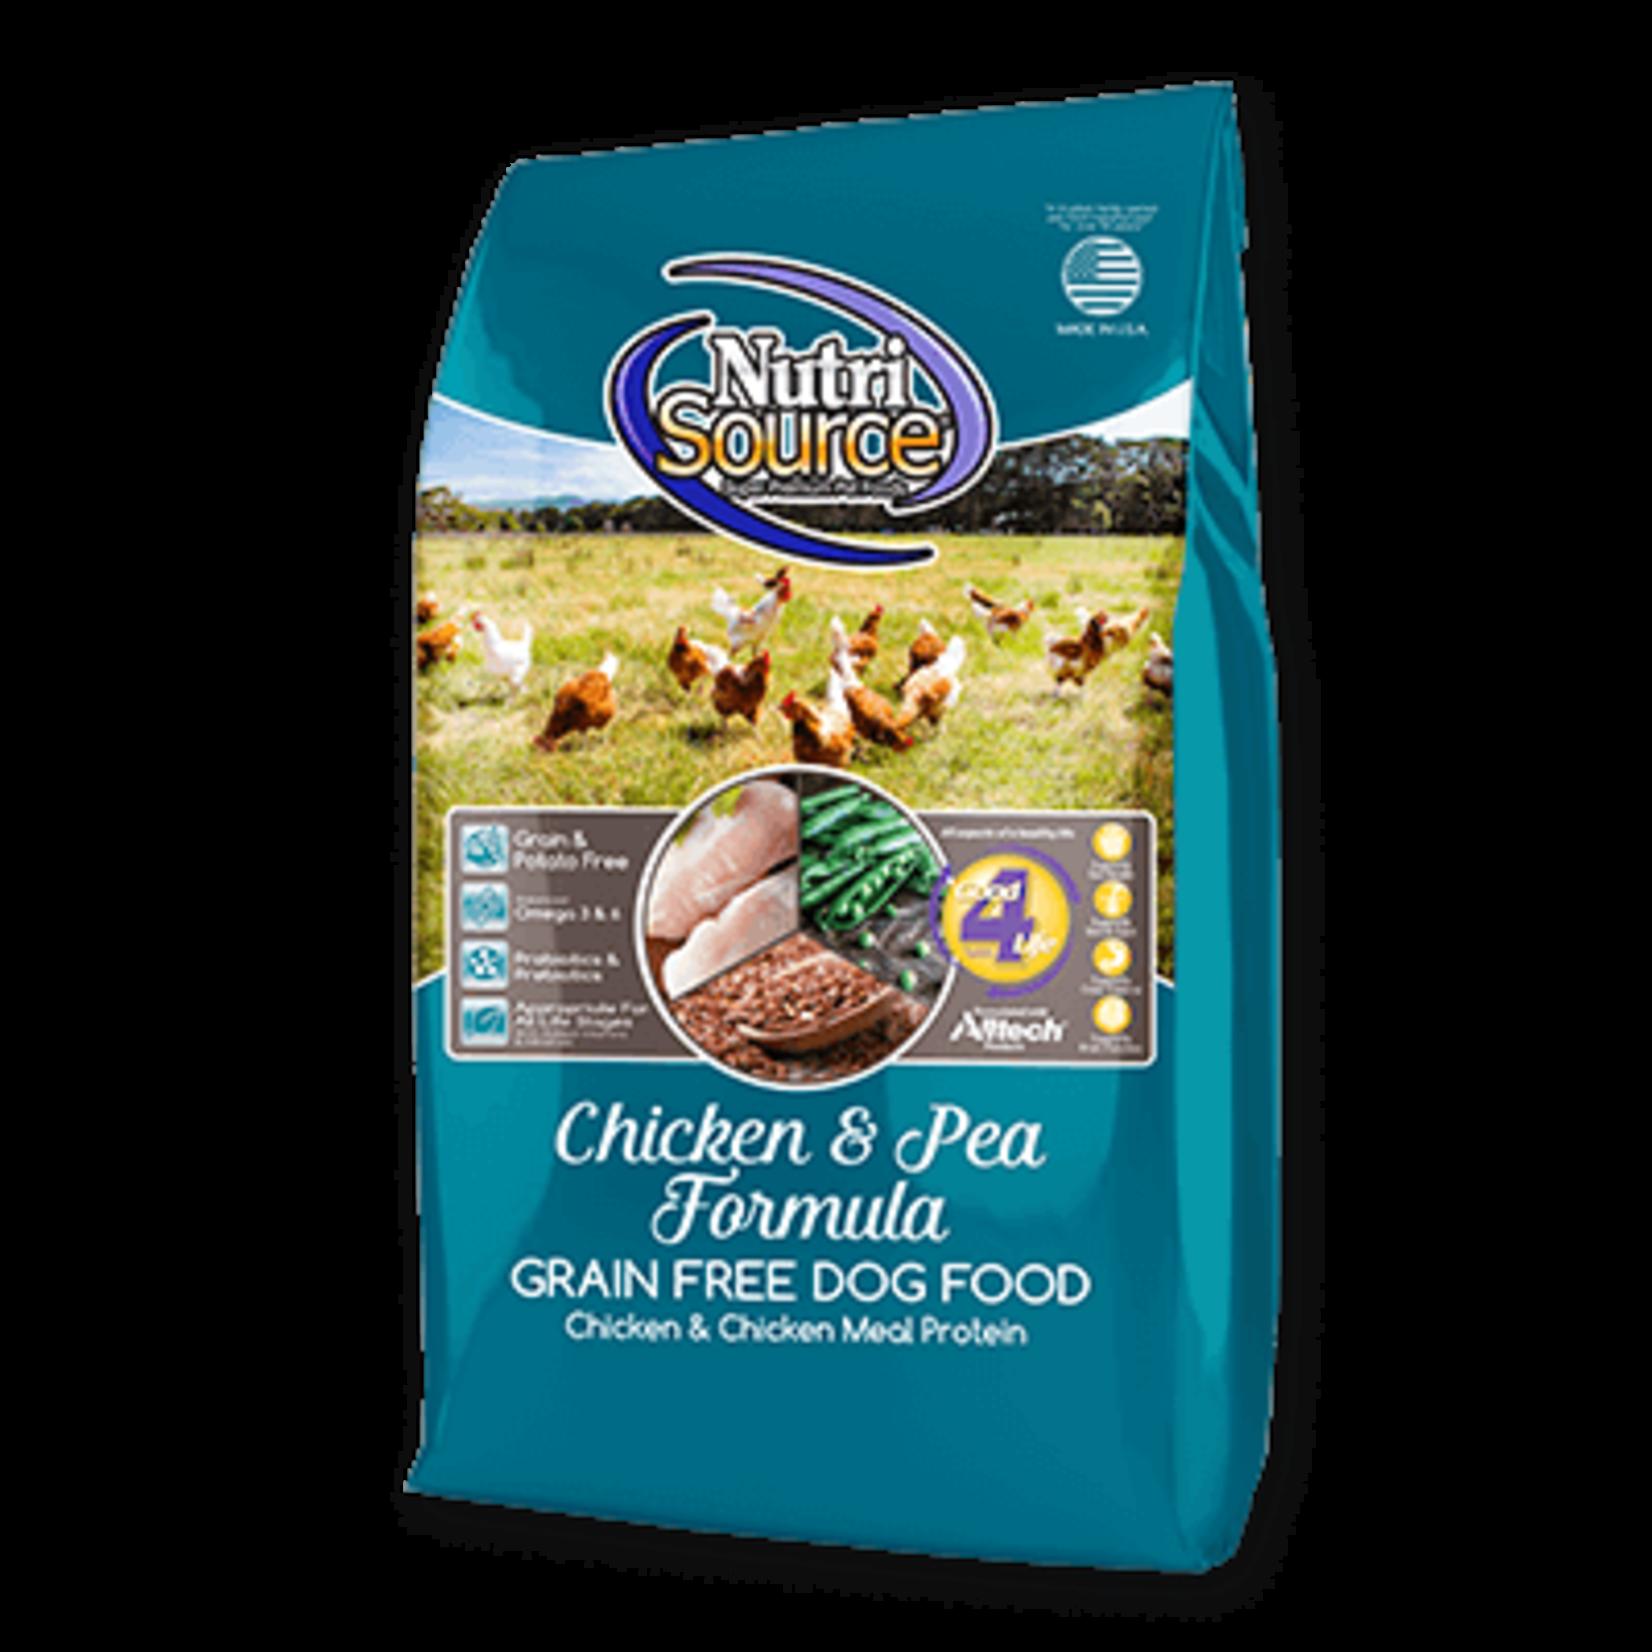 Nutrisource NutriSource Grain Free Chicken & Pea Dog Food